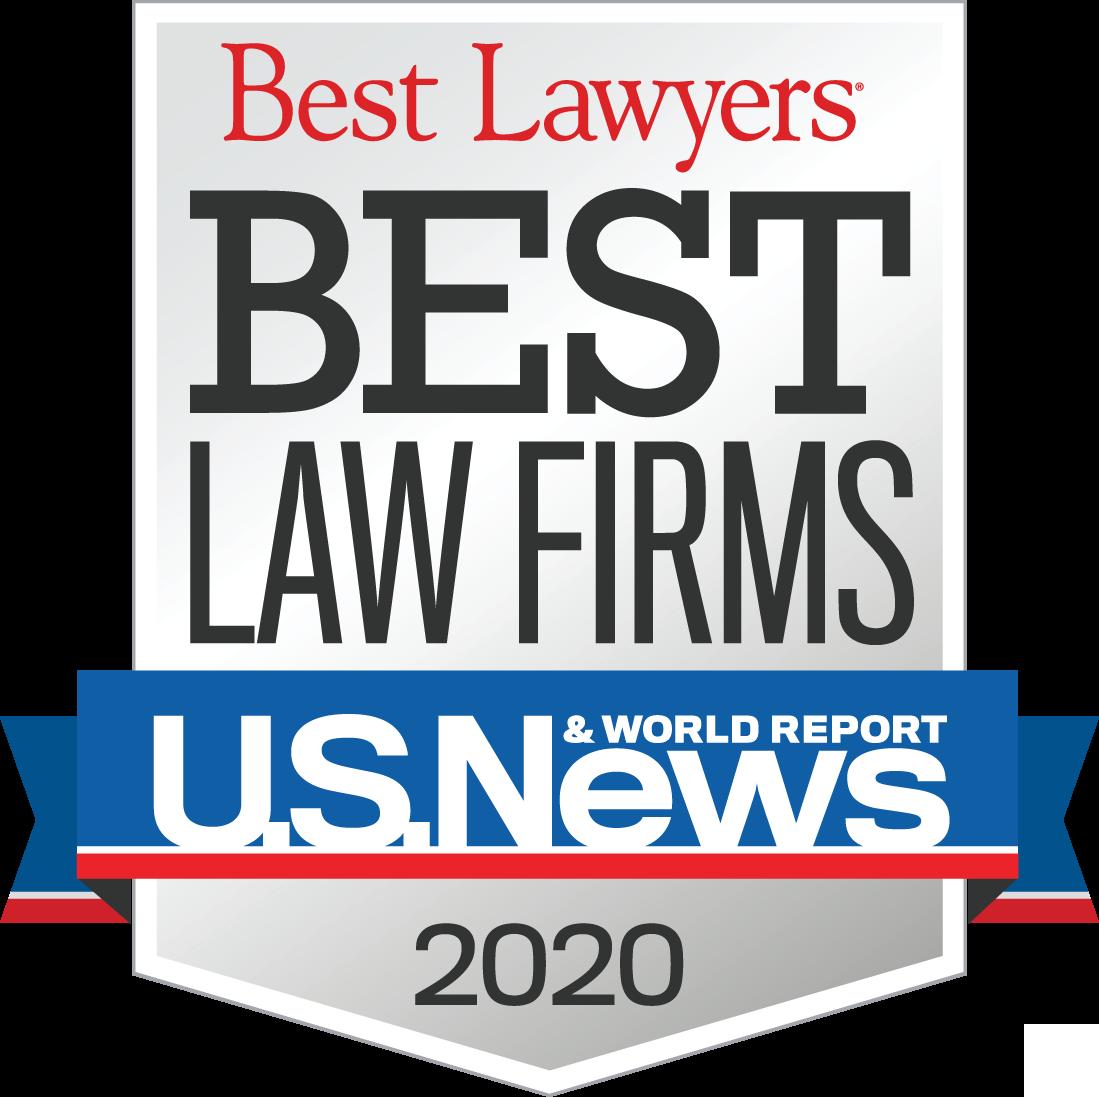 Best Lawyers Best Law Firms 2020